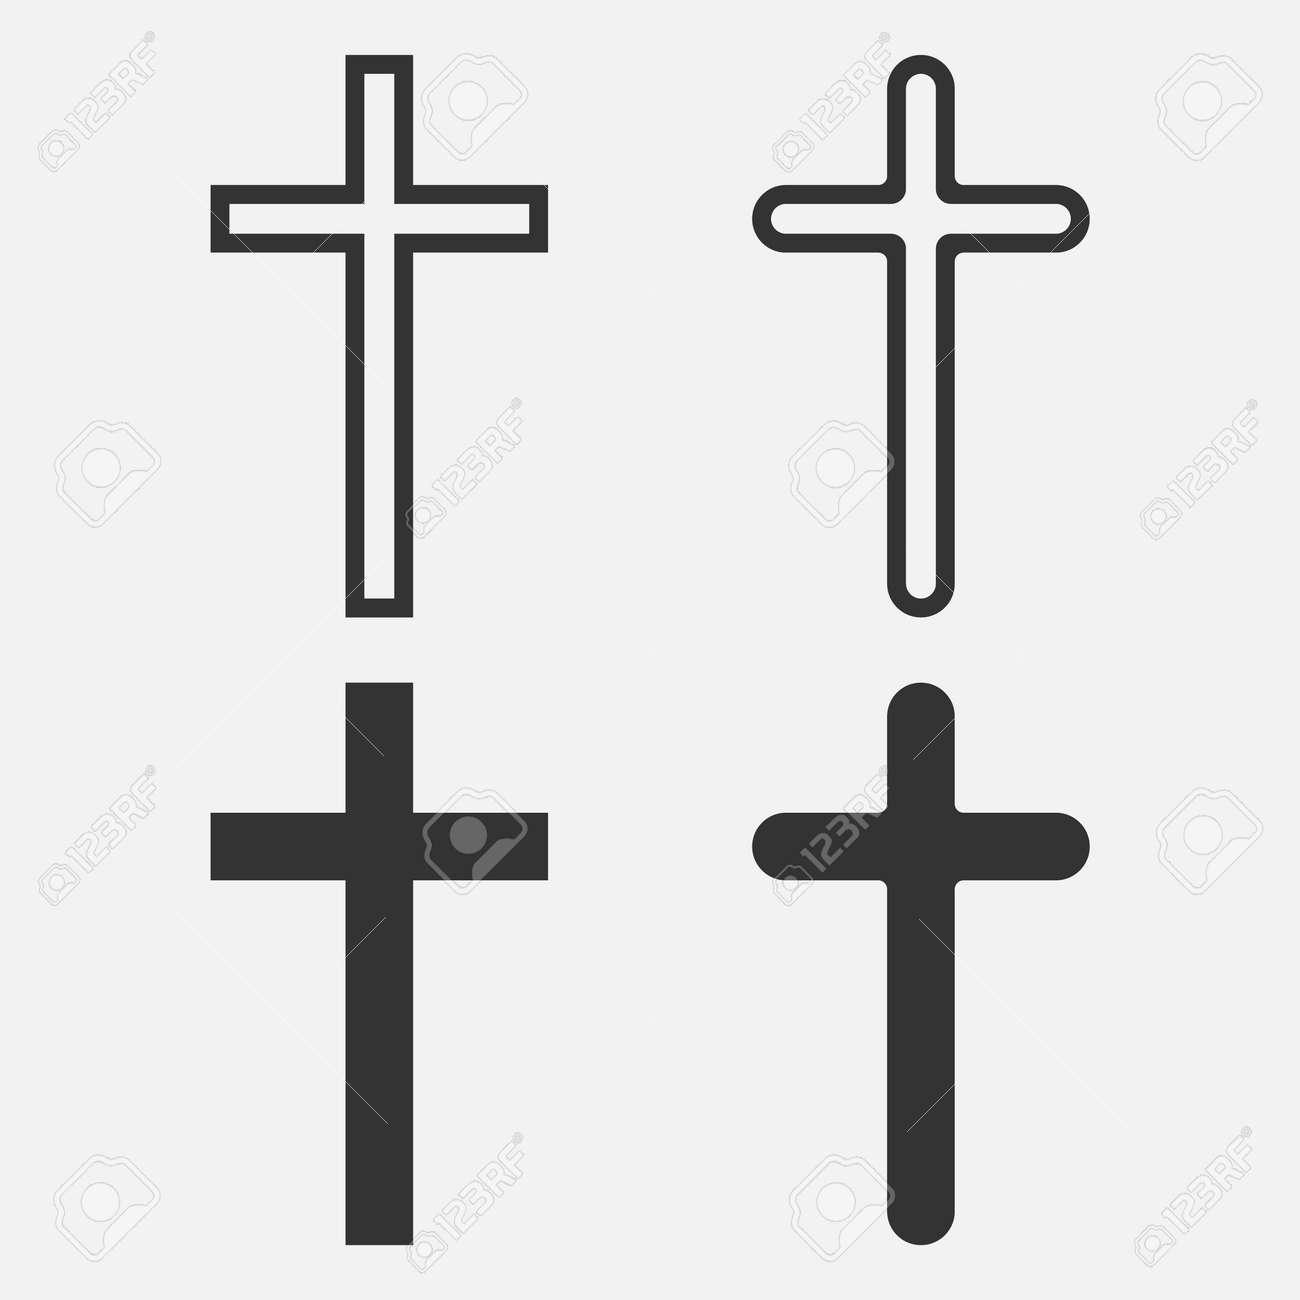 Christian Cross icon app, UI. Vector illustration. - 164871880